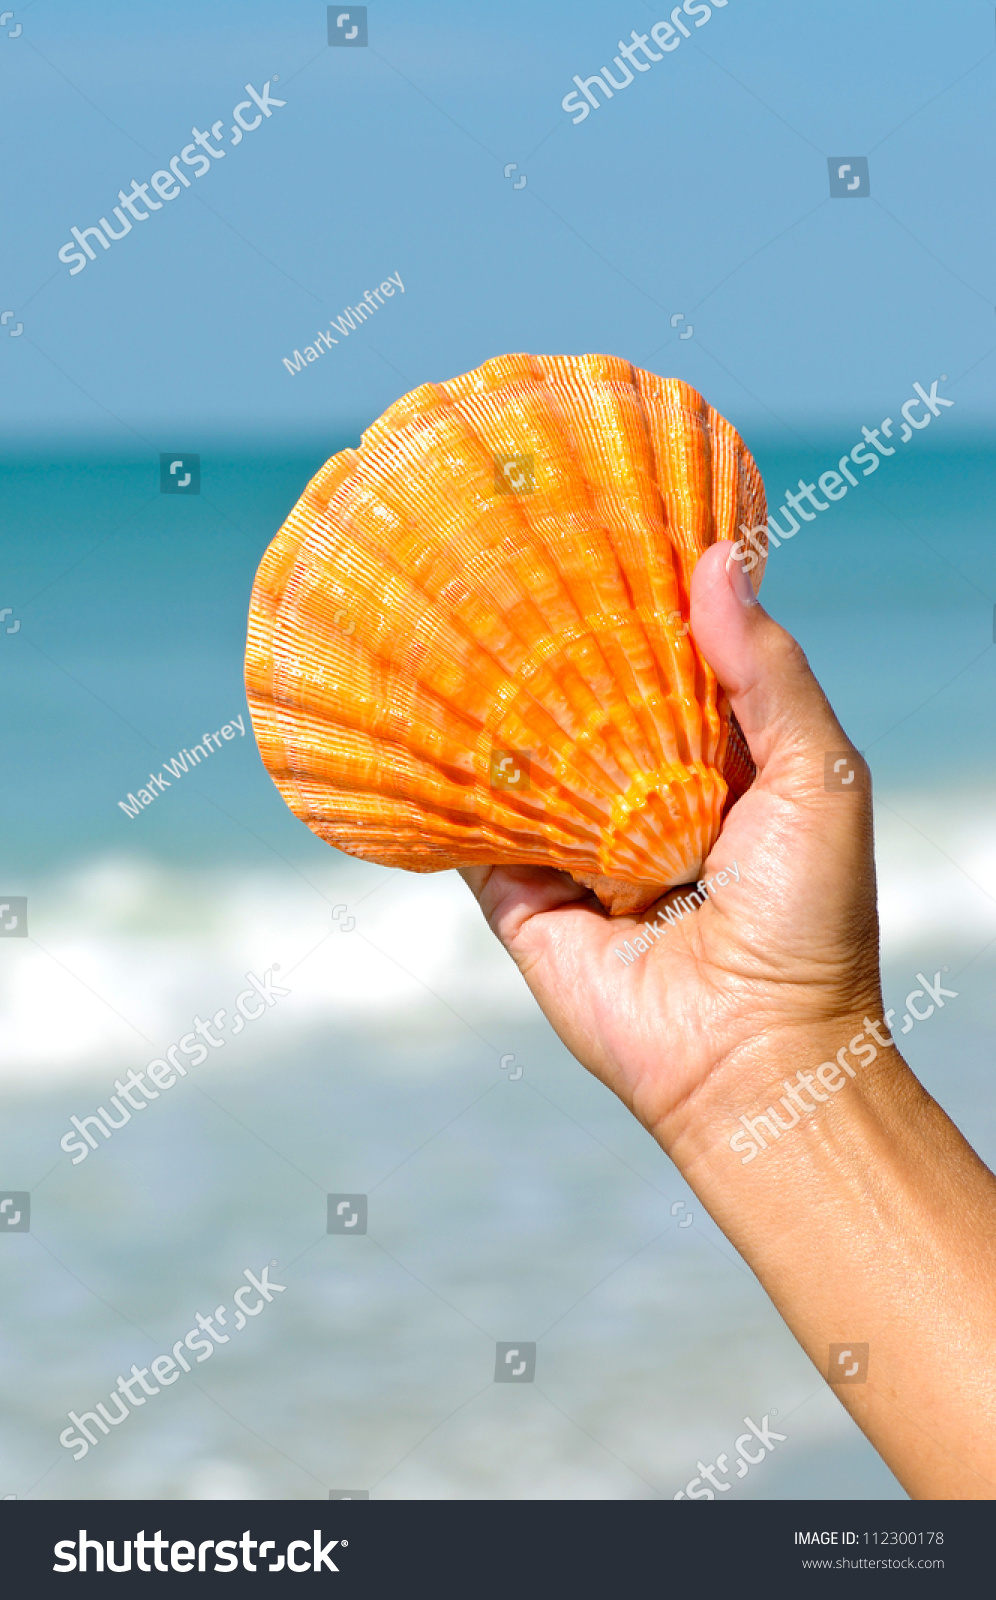 stock-photo-woman-s-hand-holding-a-seash